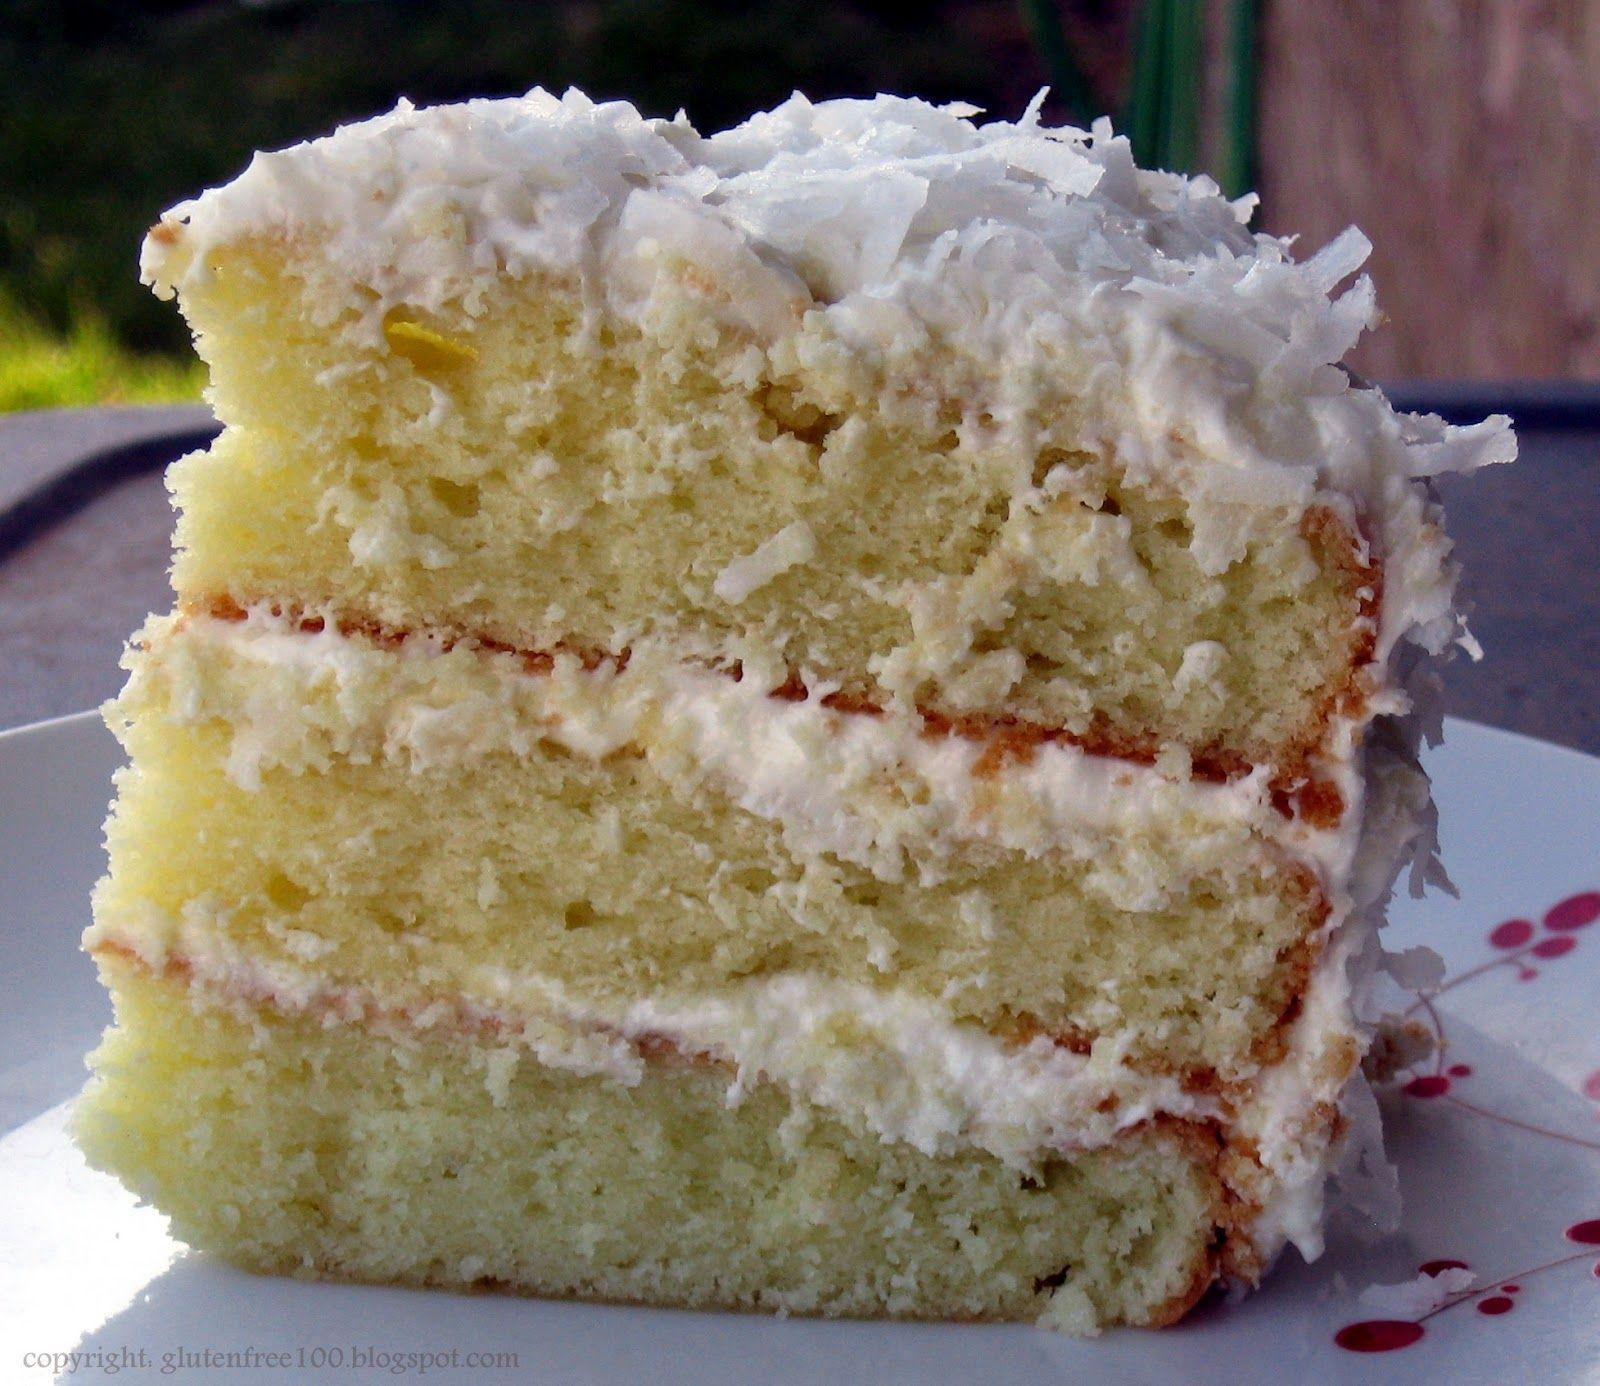 Gluten Free 3 Layer Coconut Cake with Lemon Cream Cheese